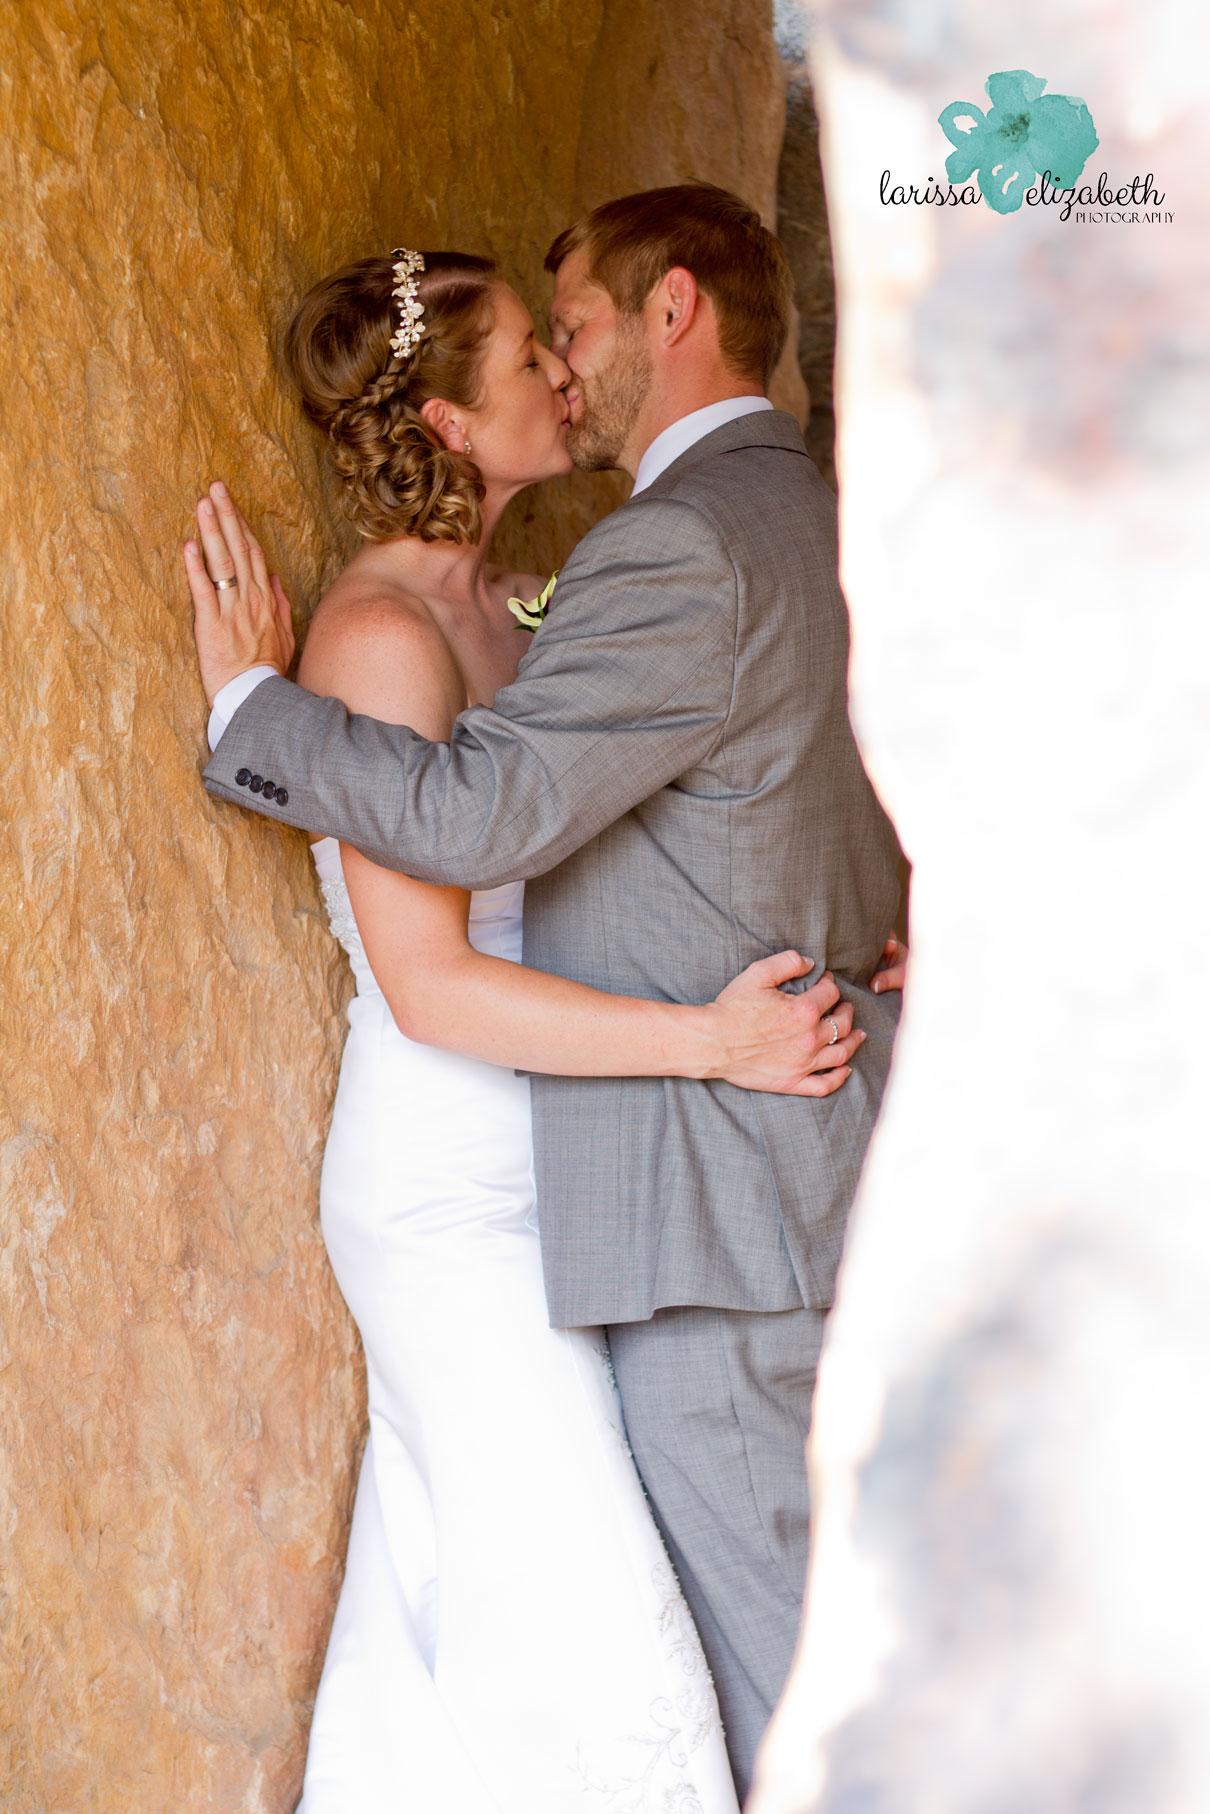 Loveland-Country-Wedding-15